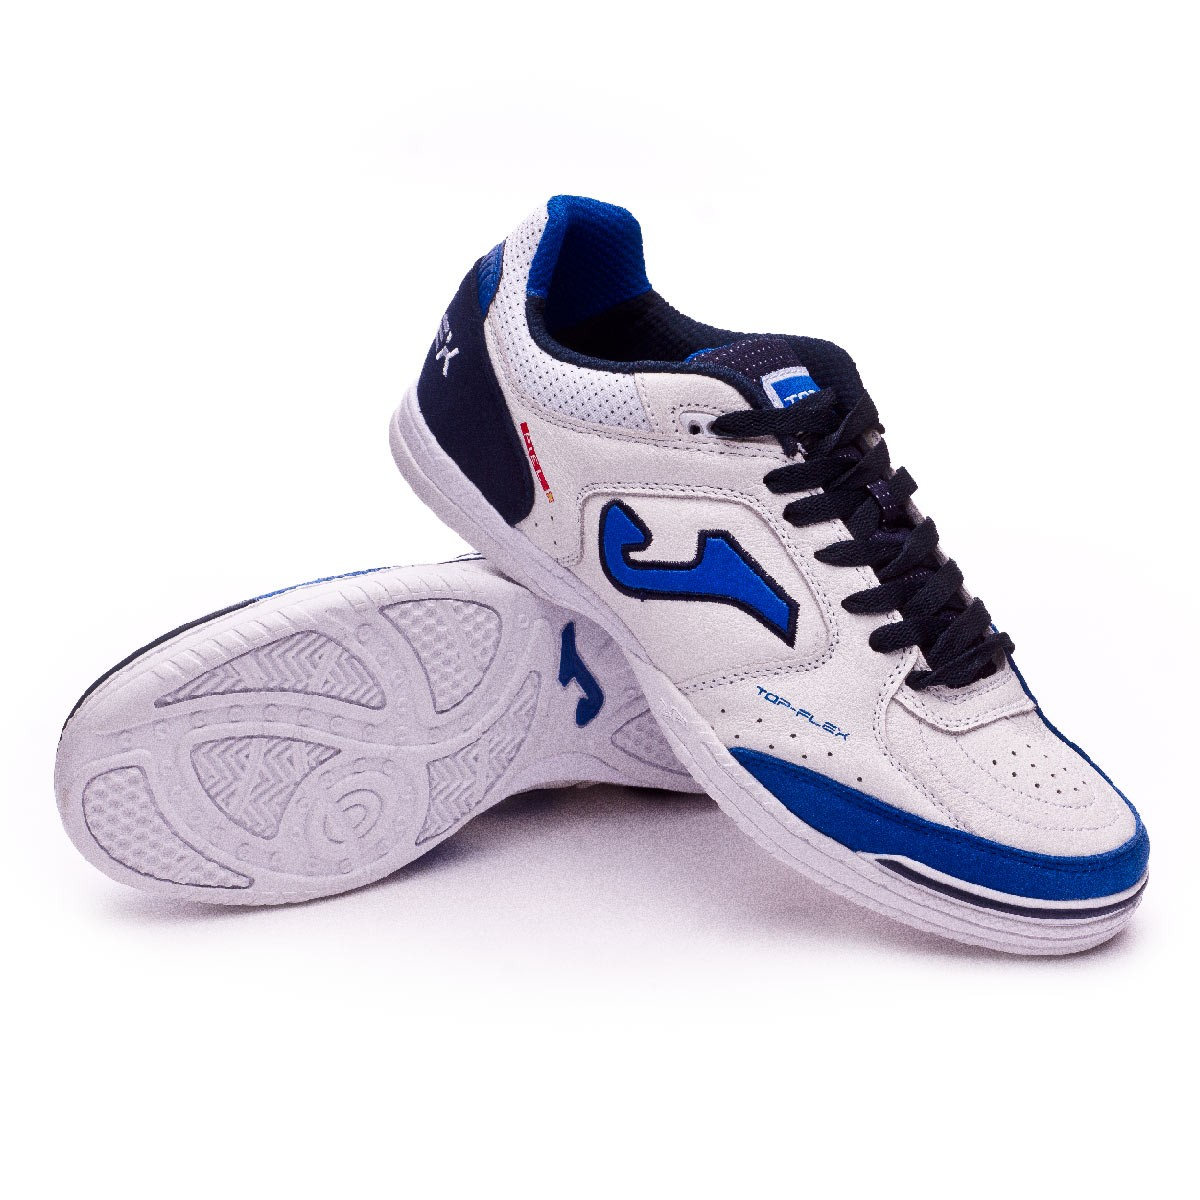 29359a6a470 Futsal Boot Joma Top Flex White-Blue - Tienda de fútbol Fútbol Emotion